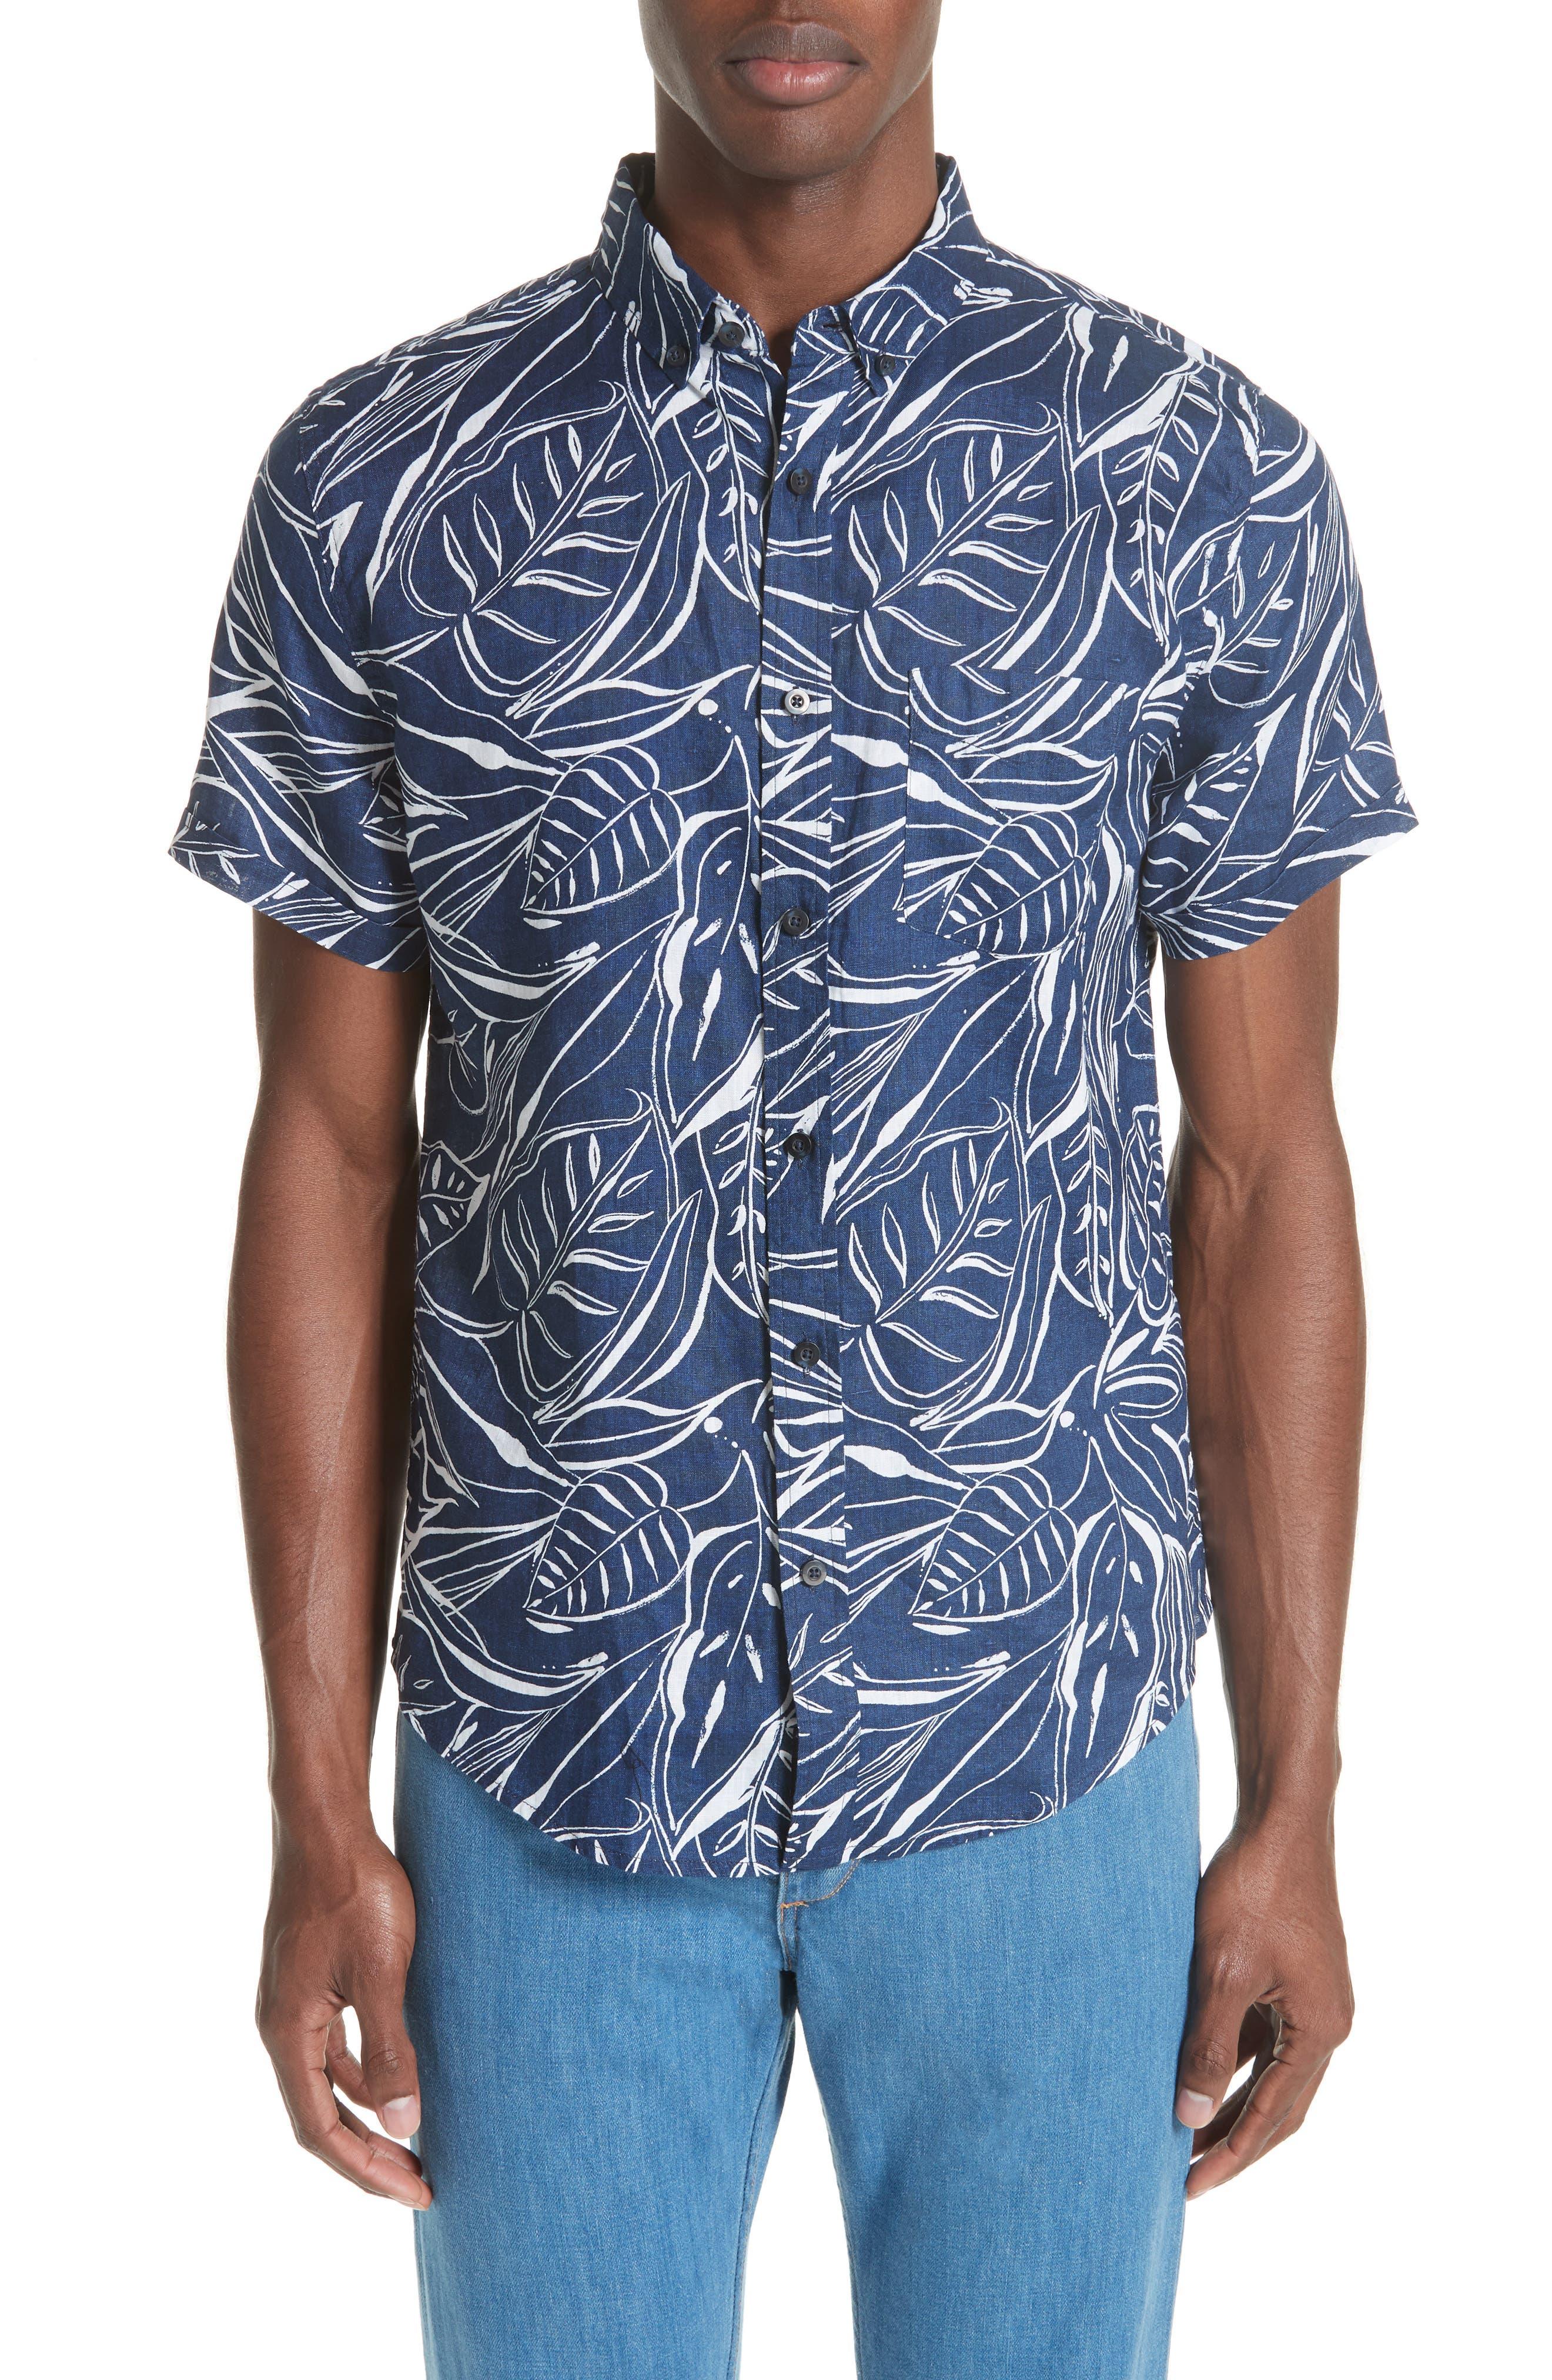 Jack Palm Print Linen Shirt,                             Main thumbnail 1, color,                             DEEP NAVY WHITE